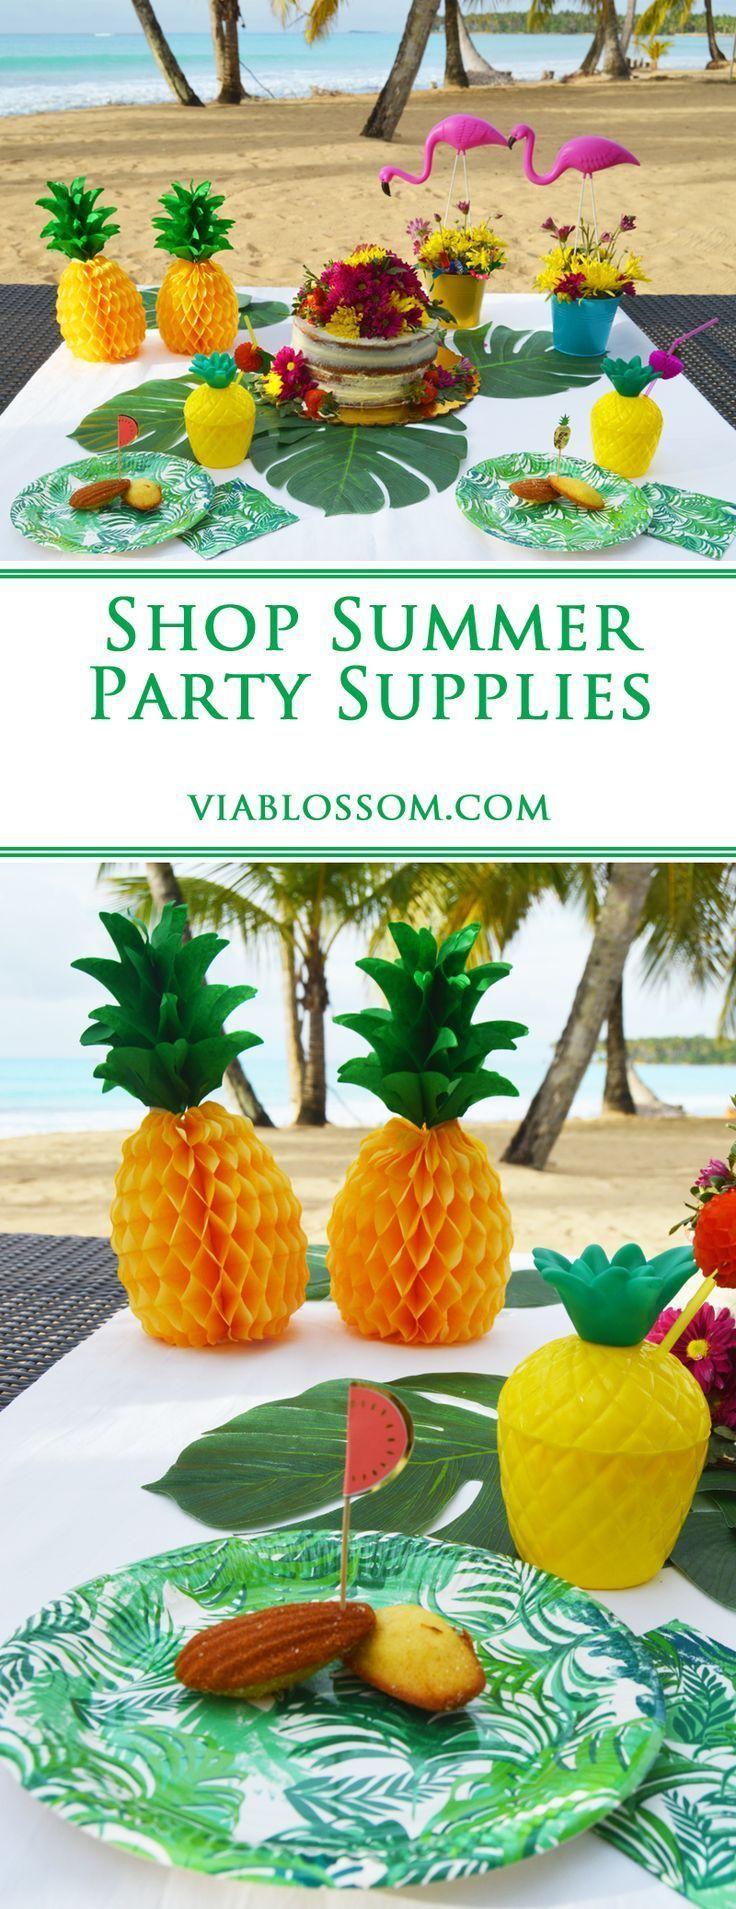 summer | party | pineapple | flamingo | decorations | tutti frutti | birthday | tropical